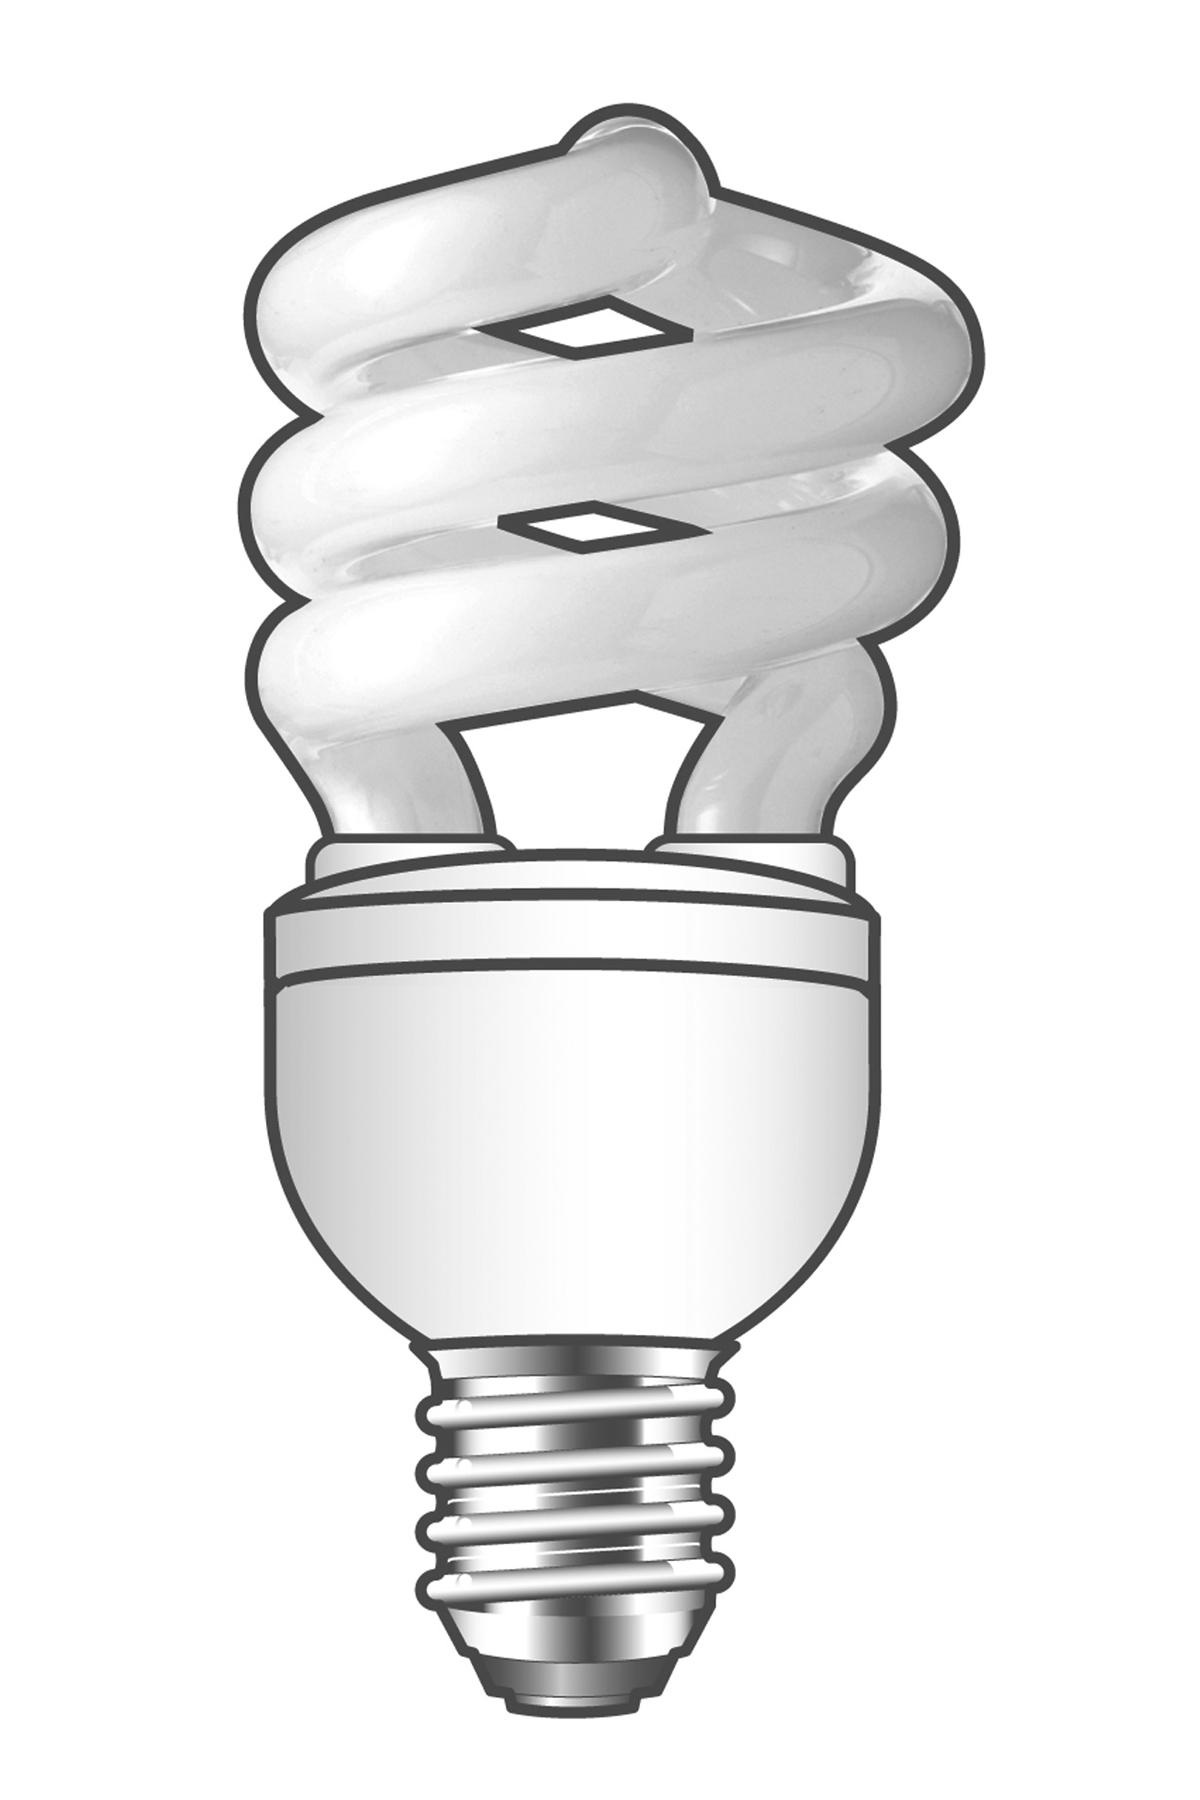 Calex Calex Esaver Spiraal 24w E27 6500k Spaarlamp Daglicht